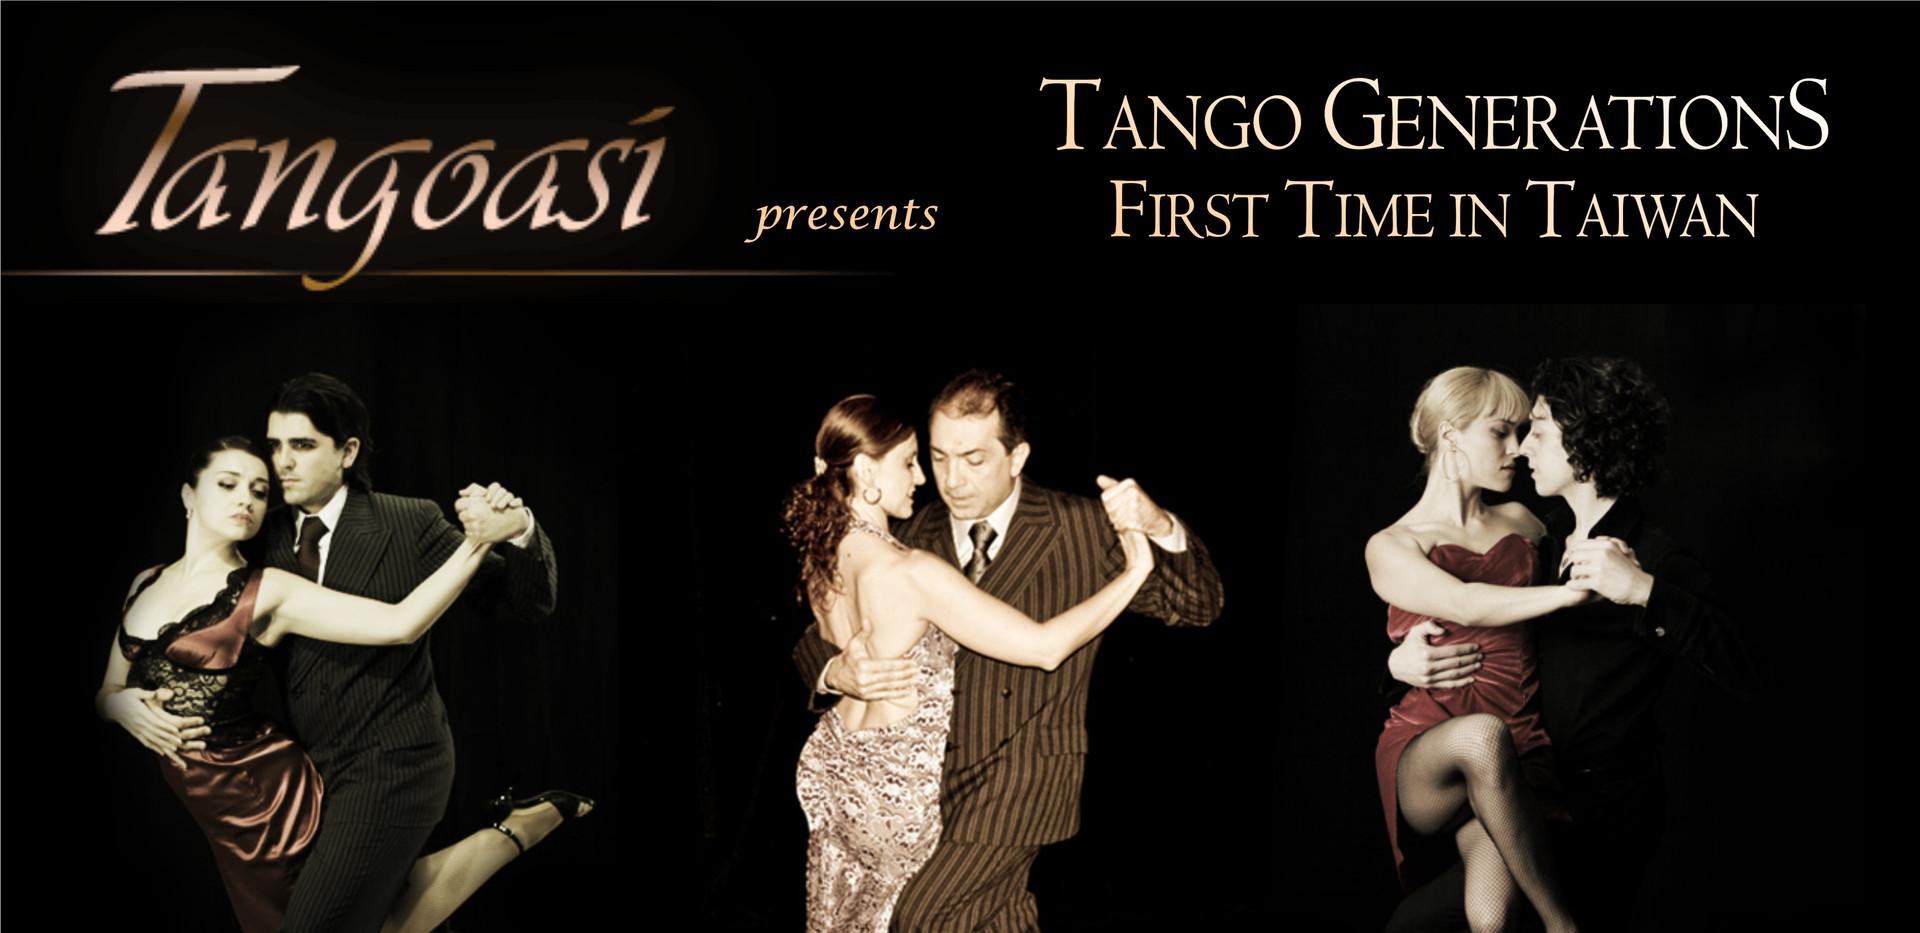 Taiwan Tango Generation